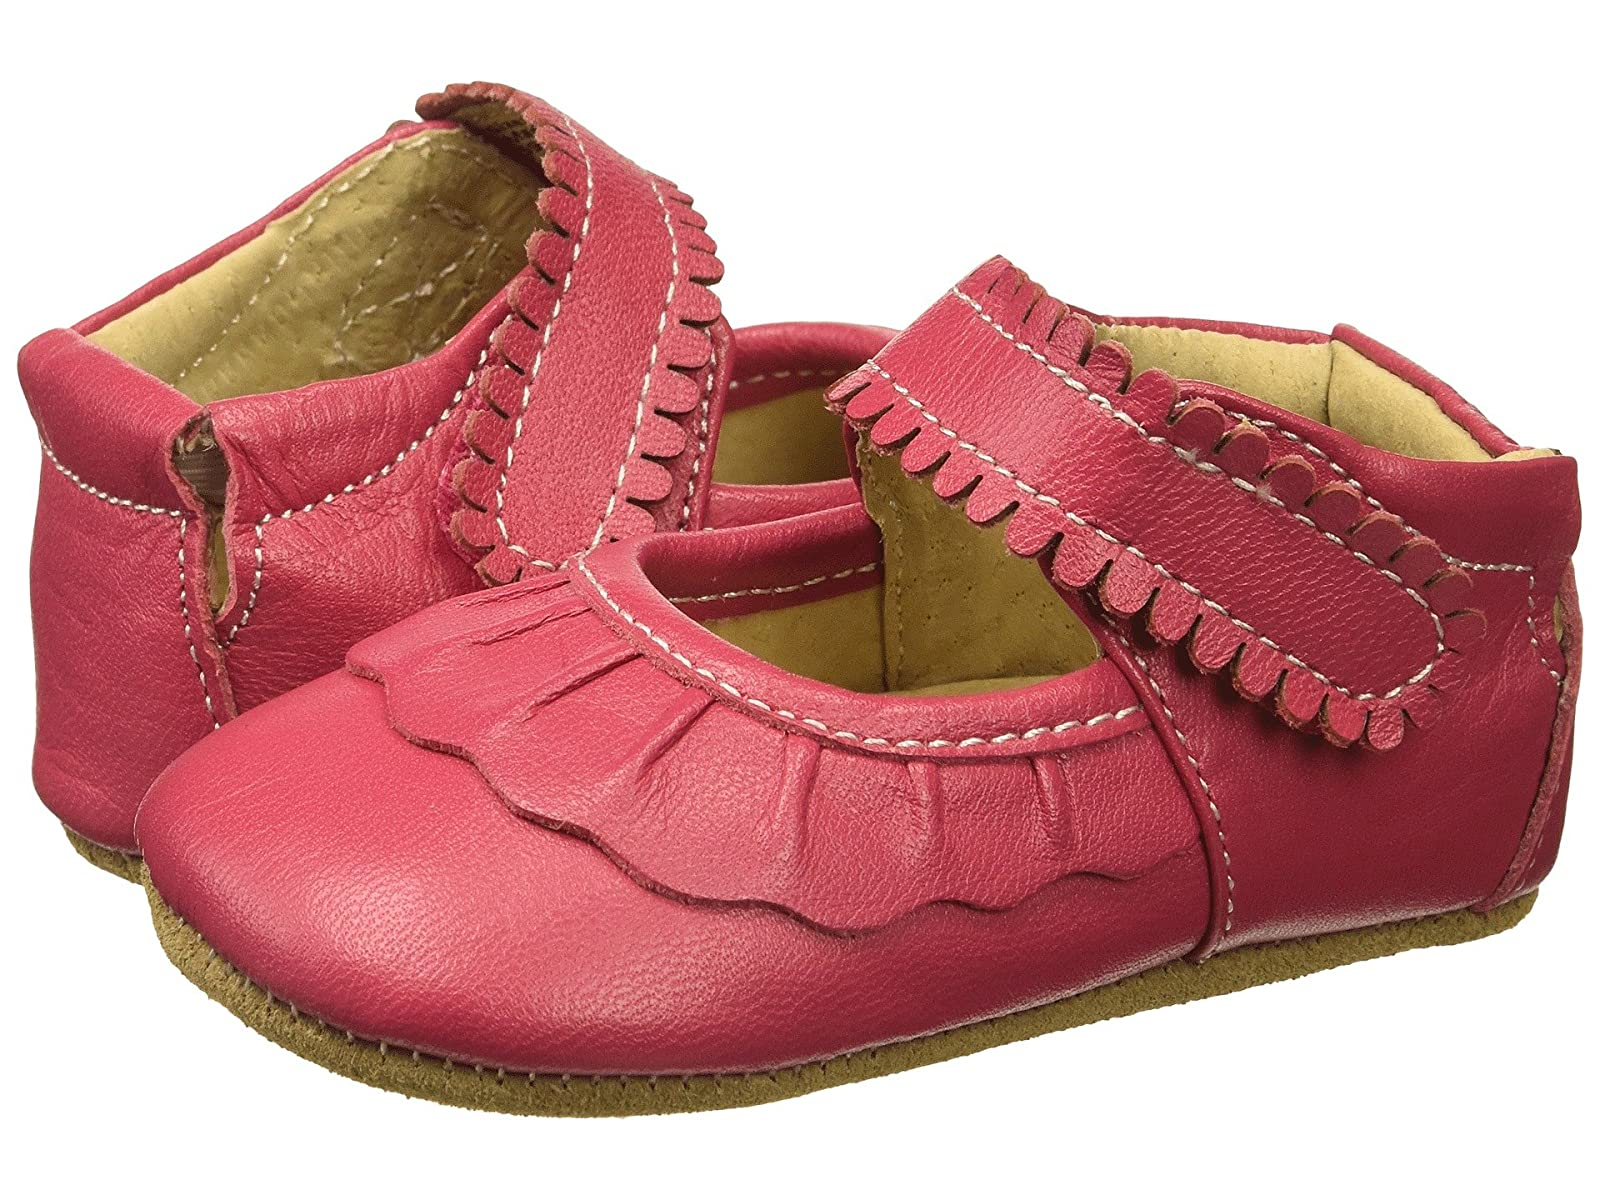 Livie & Luca Ruche (Infant)Atmospheric grades have affordable shoes